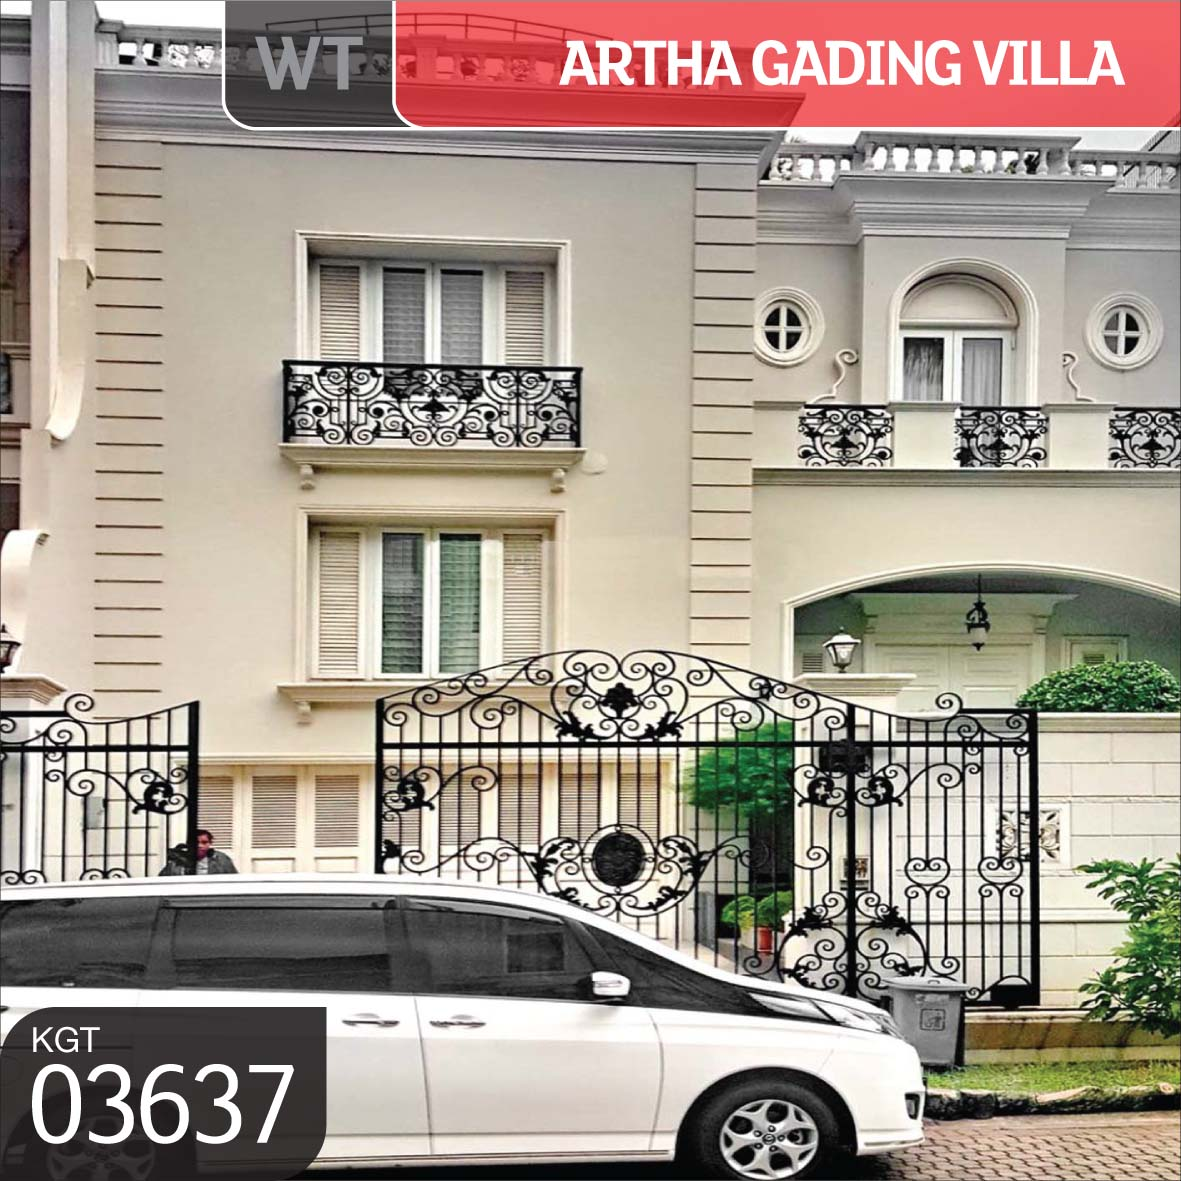 Kgt 03637 Wt For Sale Jual Rumah Artha Gading Villa Kelapa Gading Jakarta Utara Lj Hooker Kgt The Home Of Real Estate